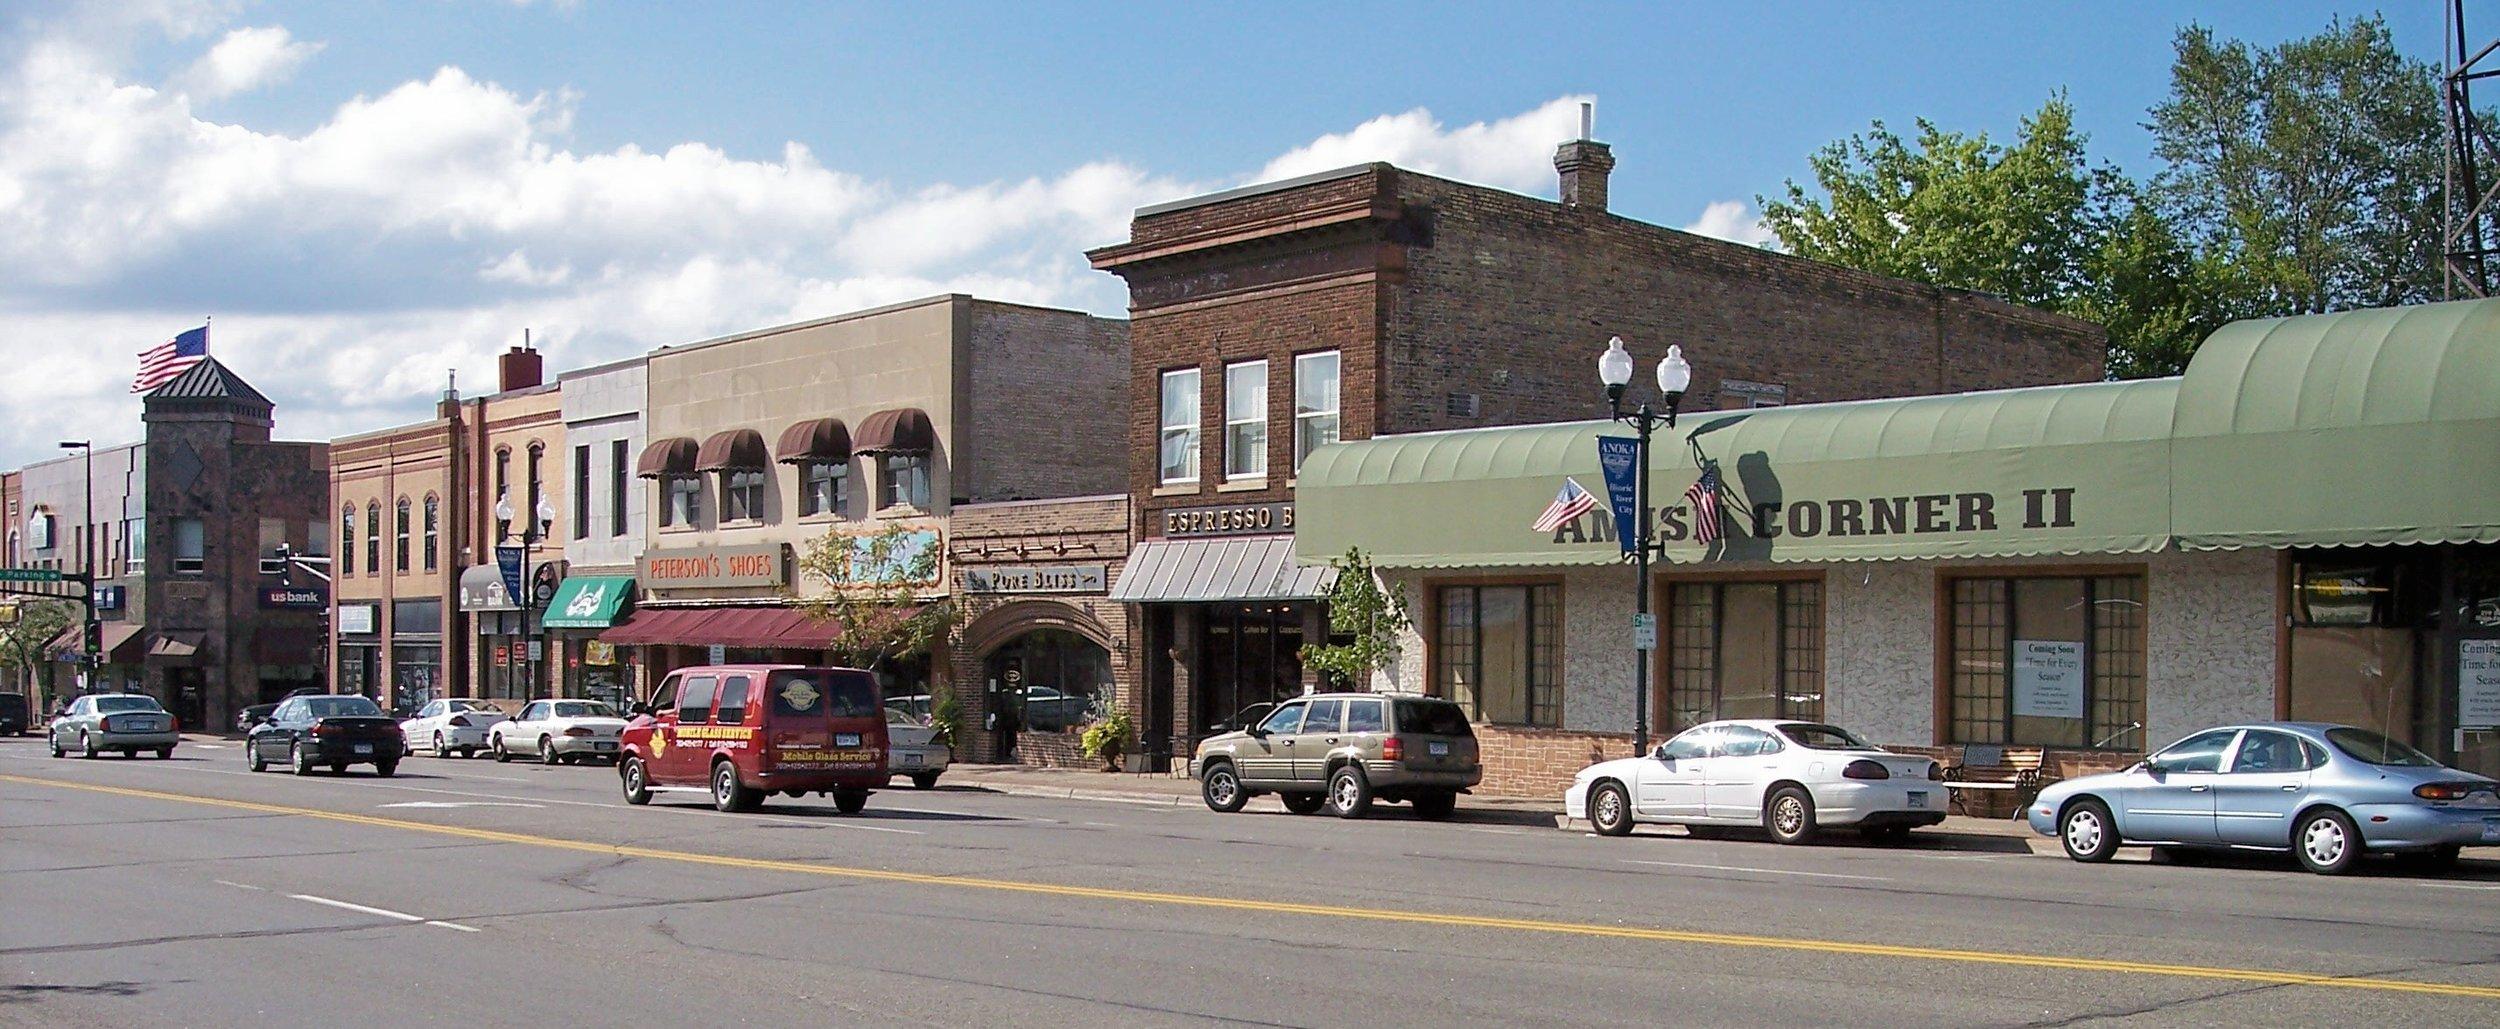 Anoka_Minnesota_Main_Street.jpg